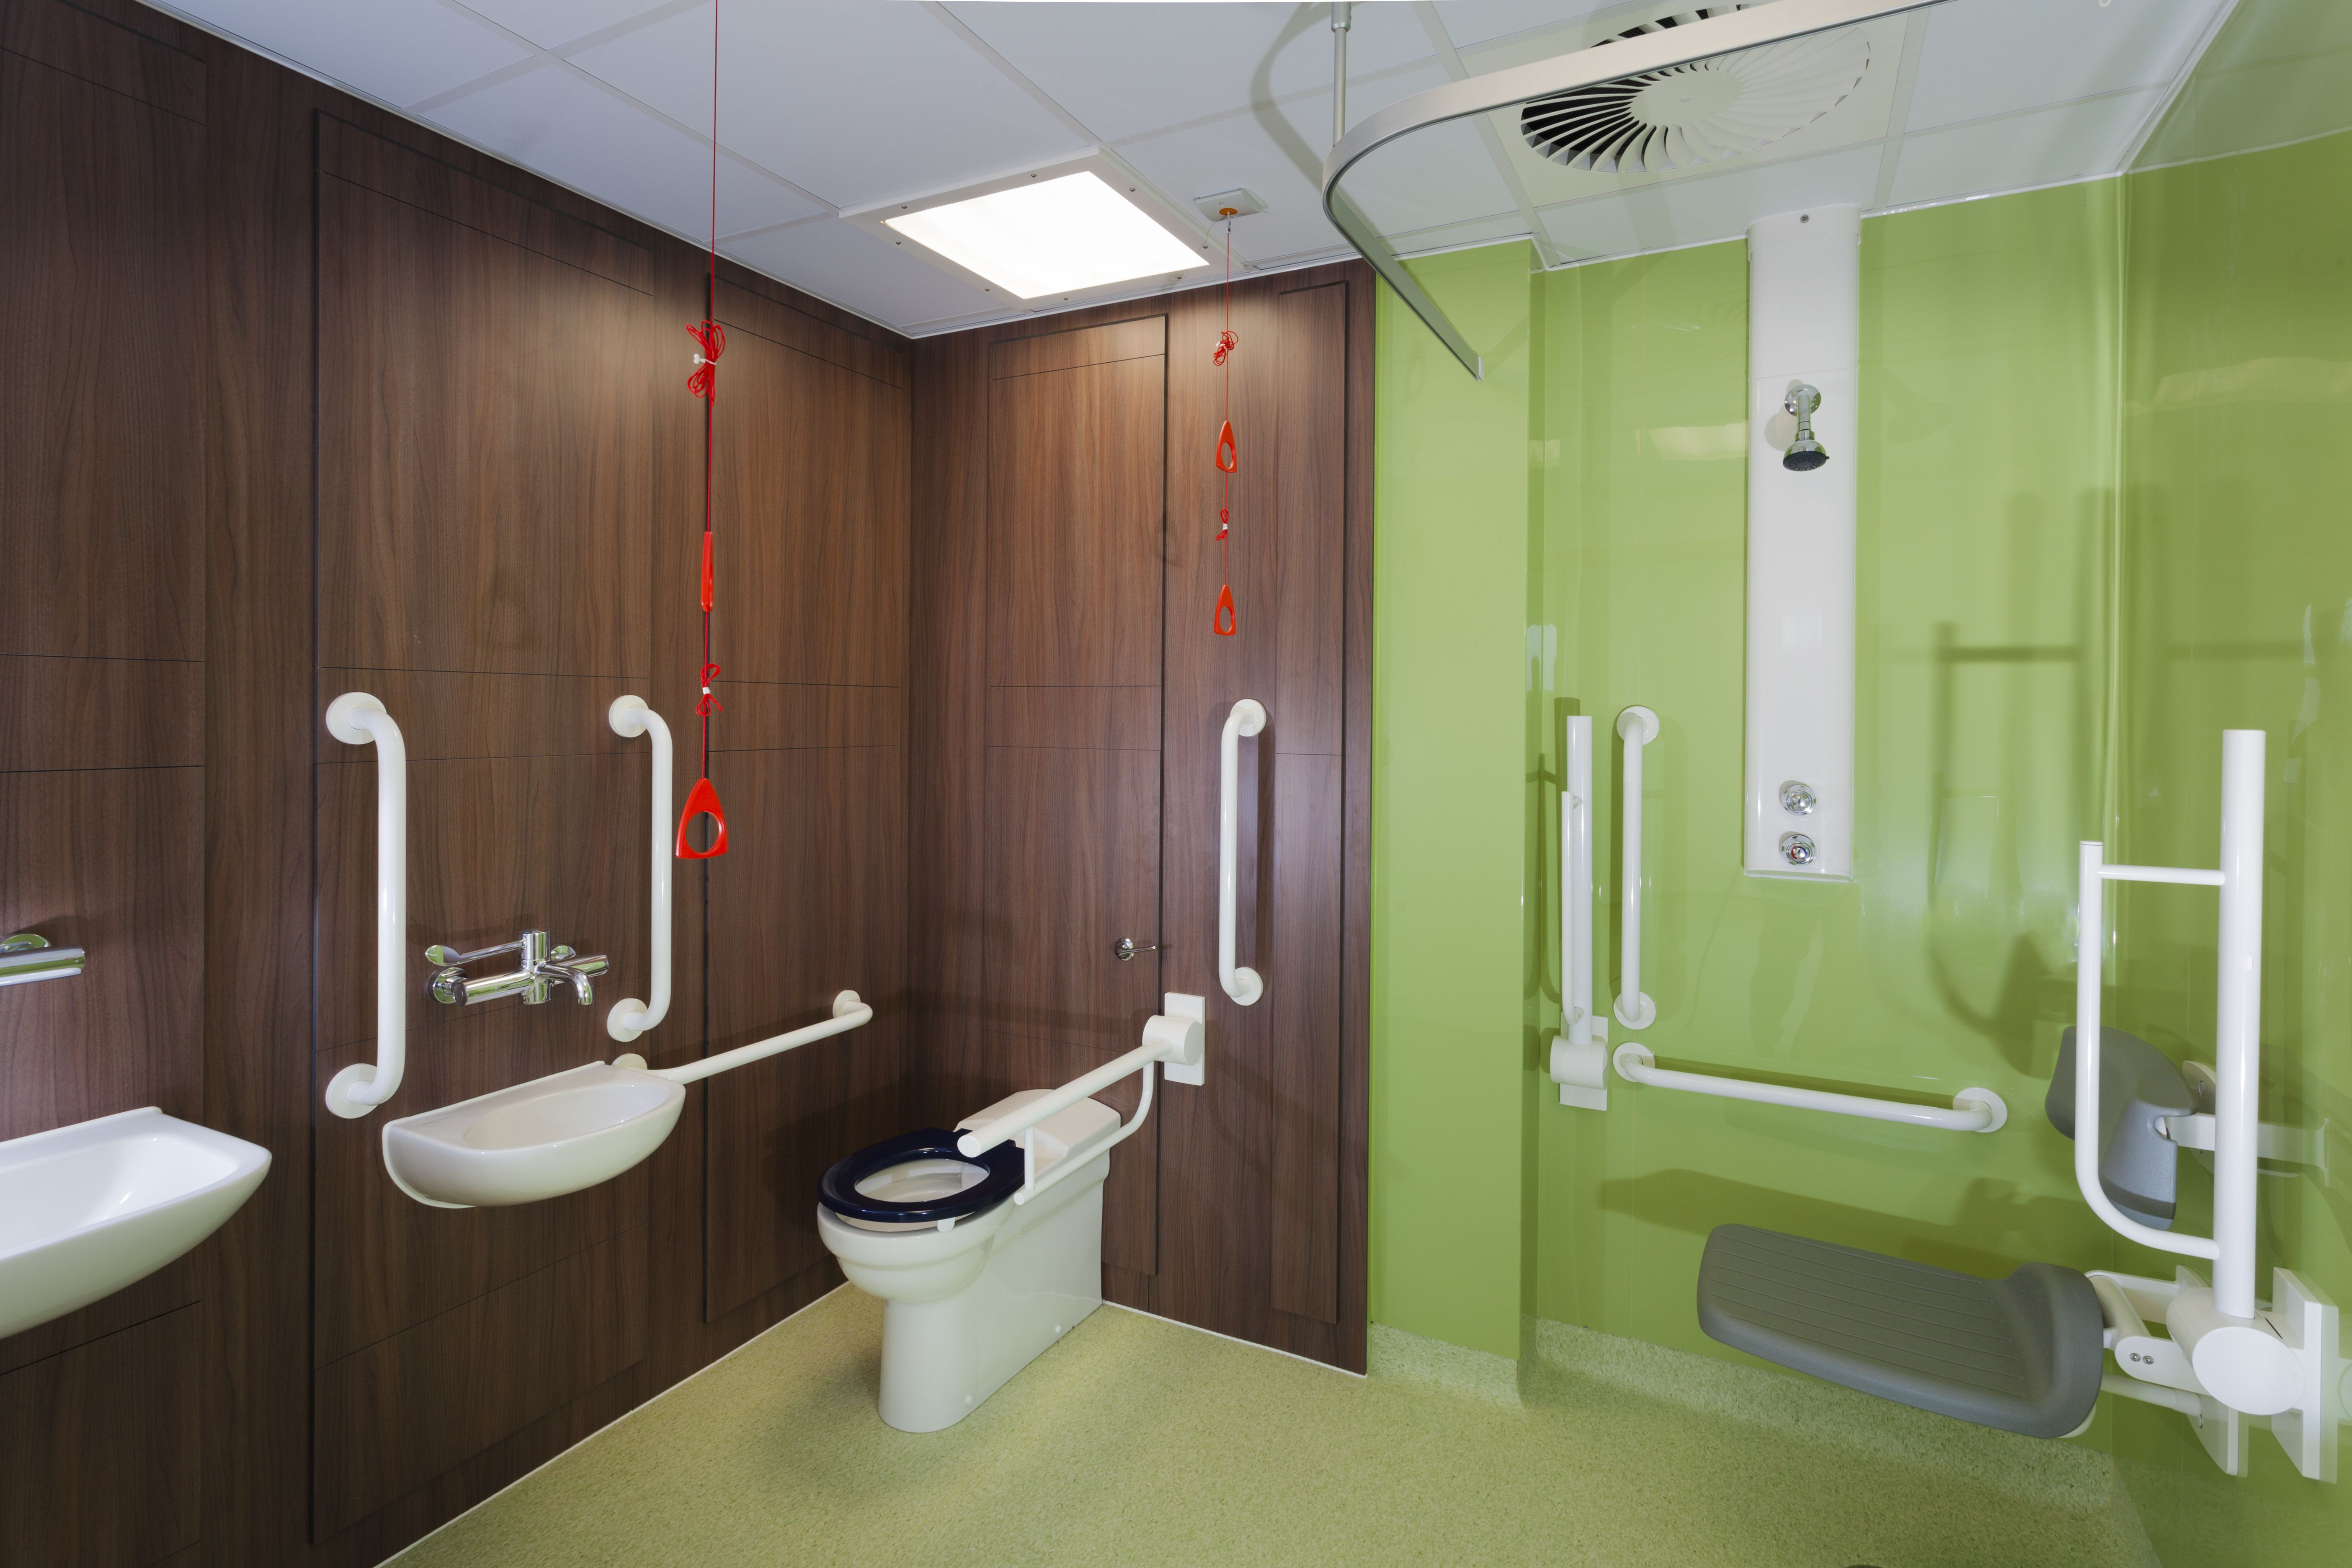 Installing Grab Bars in mercial Bathrooms